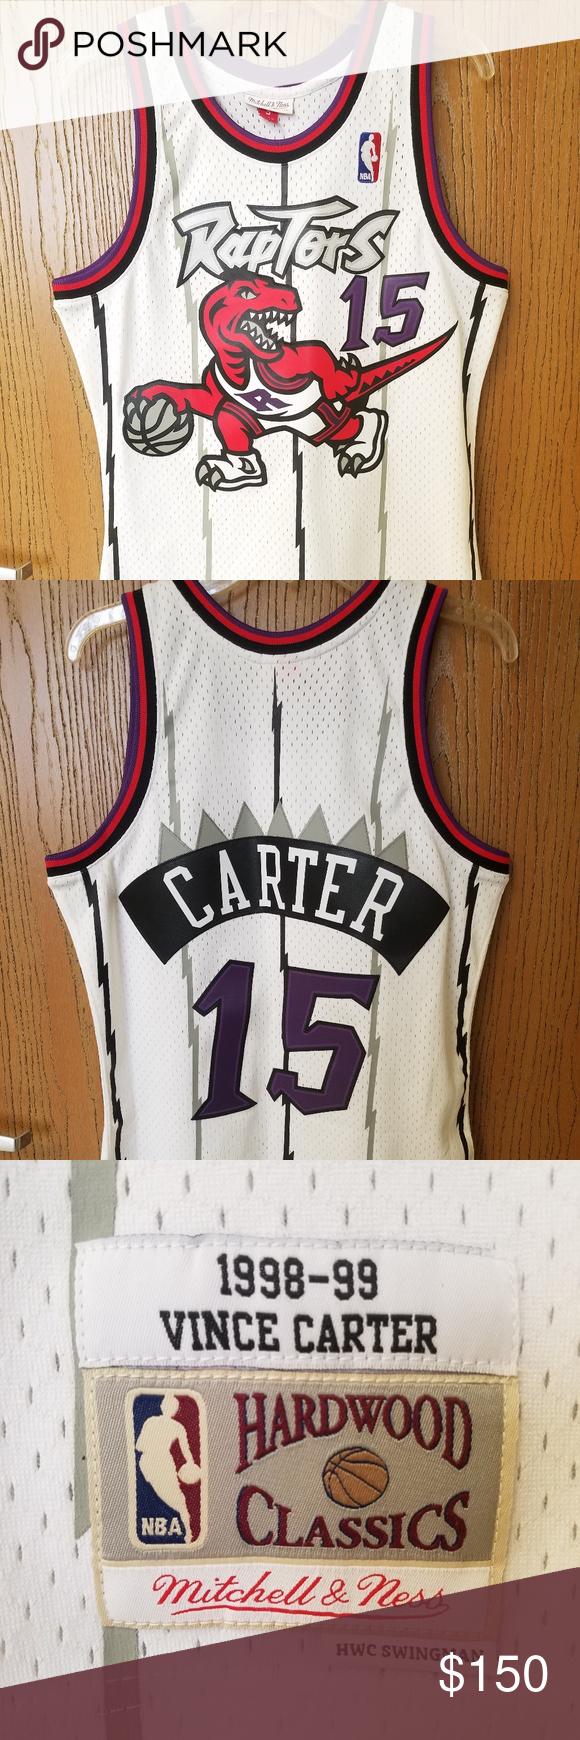 894d969229b Vtg Mitchell & Ness Vince Carter 15 Raptors Jersey New without tags Mitchell  and ness hardwood classics swingman jersey. NBA Toronto Raptors Vince Carter  ...